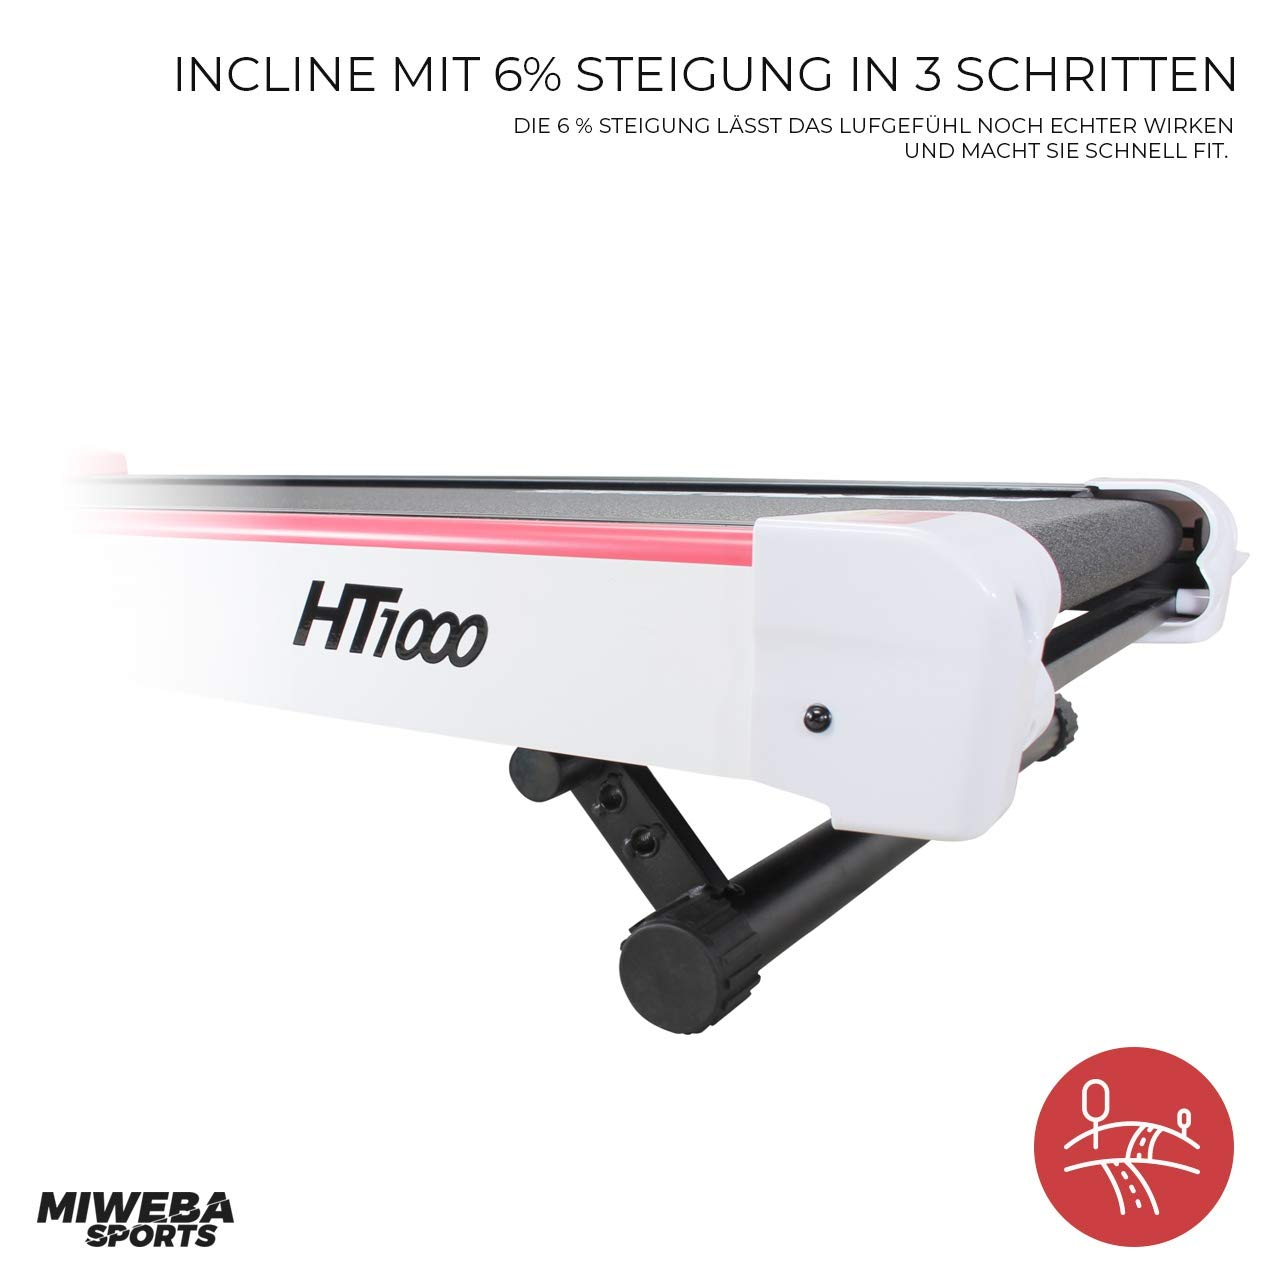 Gro/ße Lauffl/äche HT1000 Rosa Incline 6/% 16 Km//h Miweba Sports elektrisches Laufband Ht1000 Klappbar Tablet Halterung 12+4 Laufprogramme 1,75 Ps